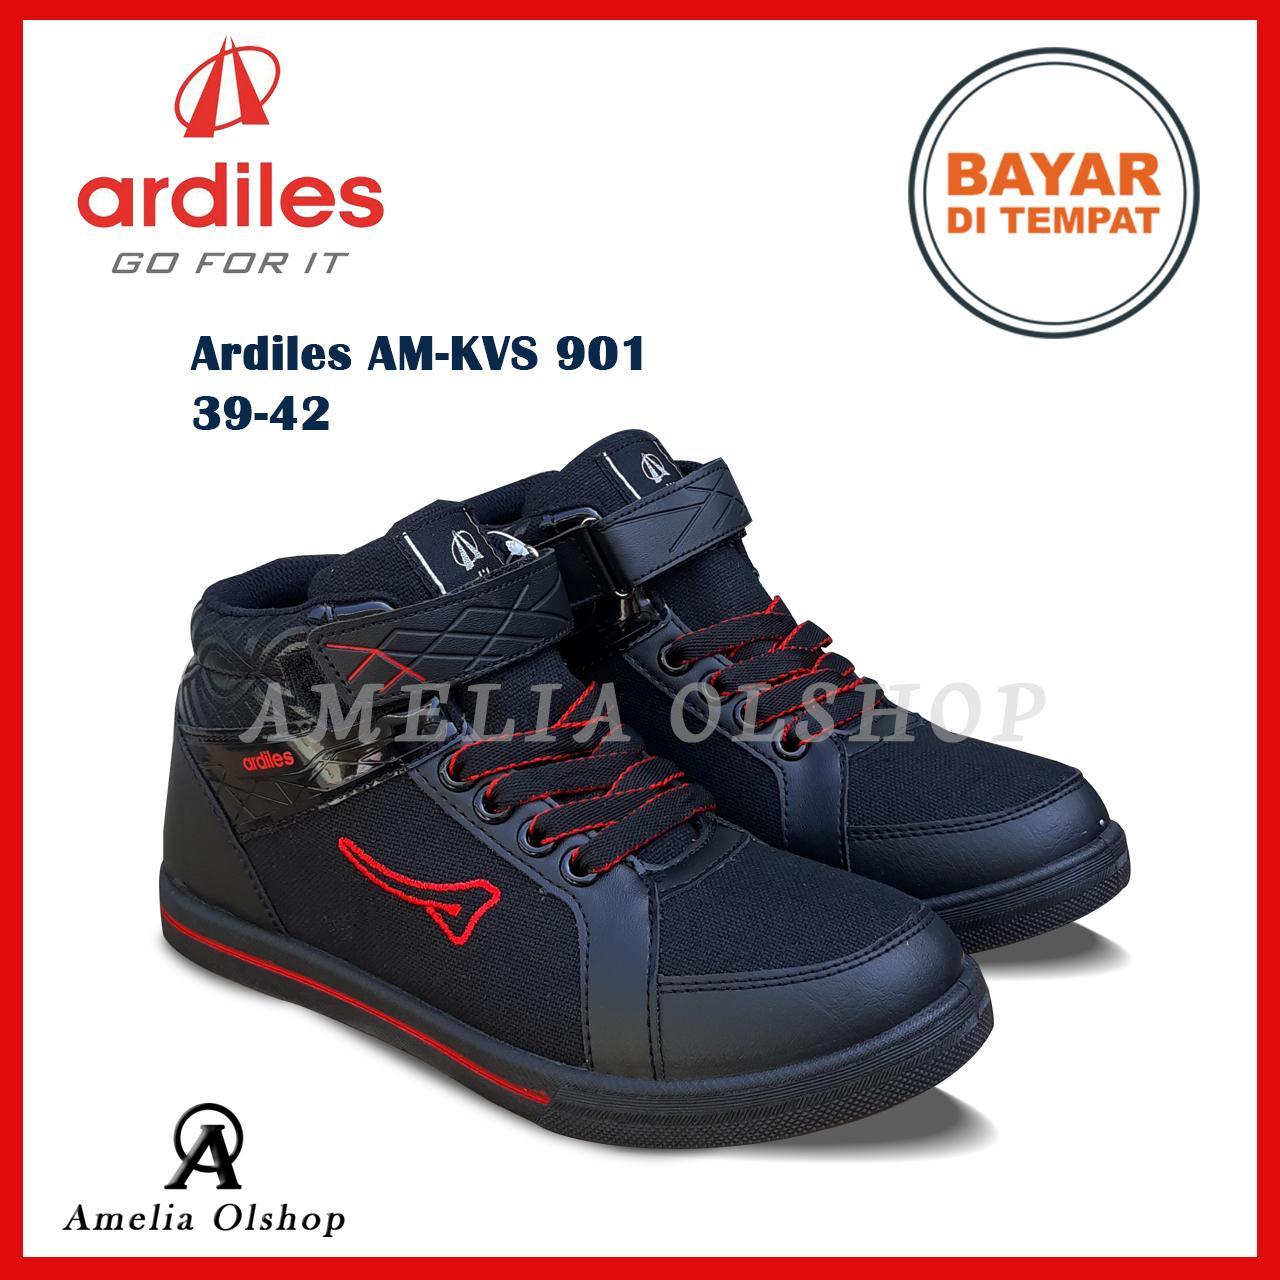 Amelia Olshop - Ardiles Sepatu Sekolah Jaman Now AM-KVS-901 29bfed901b